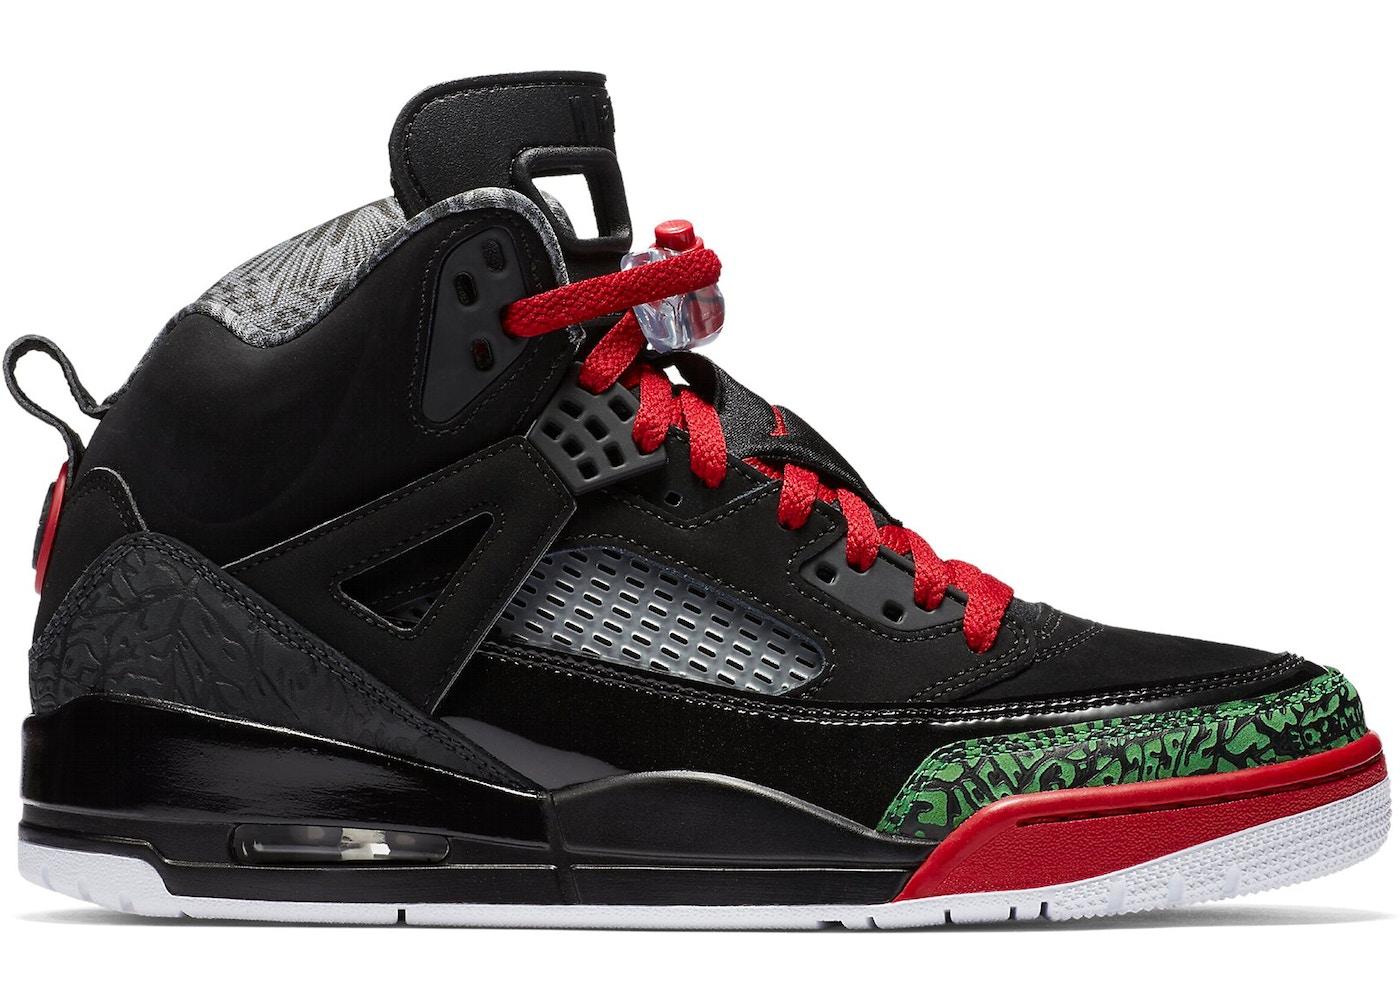 watch 8753a 7c253 Buy Air Jordan Spizike Shoes   Deadstock Sneakers